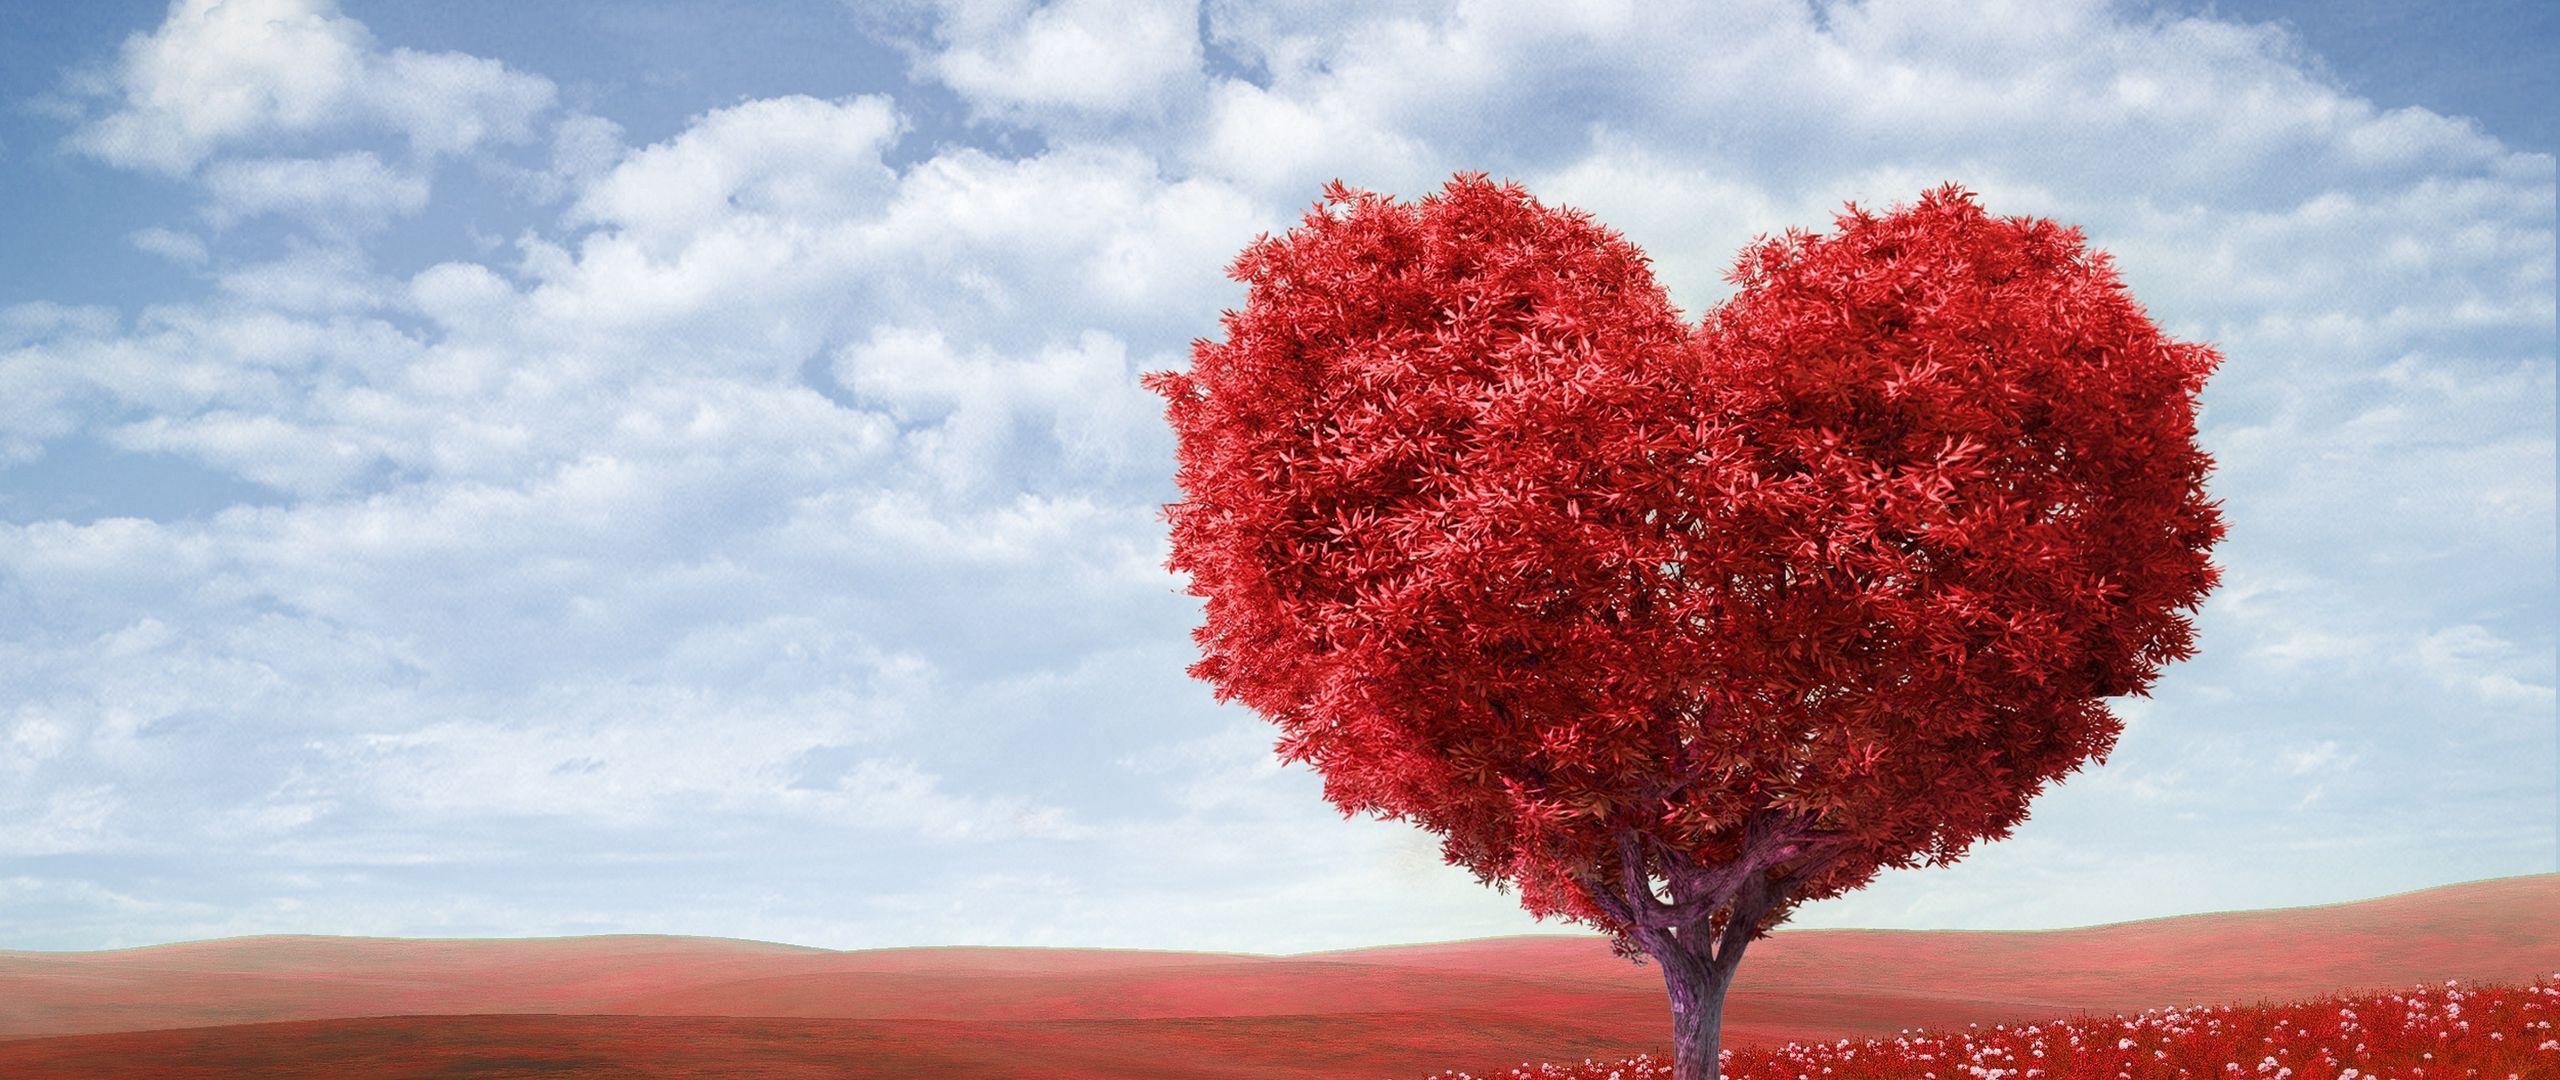 2560x1080 Wallpaper tree, heart, photoshop, field, grass, romance